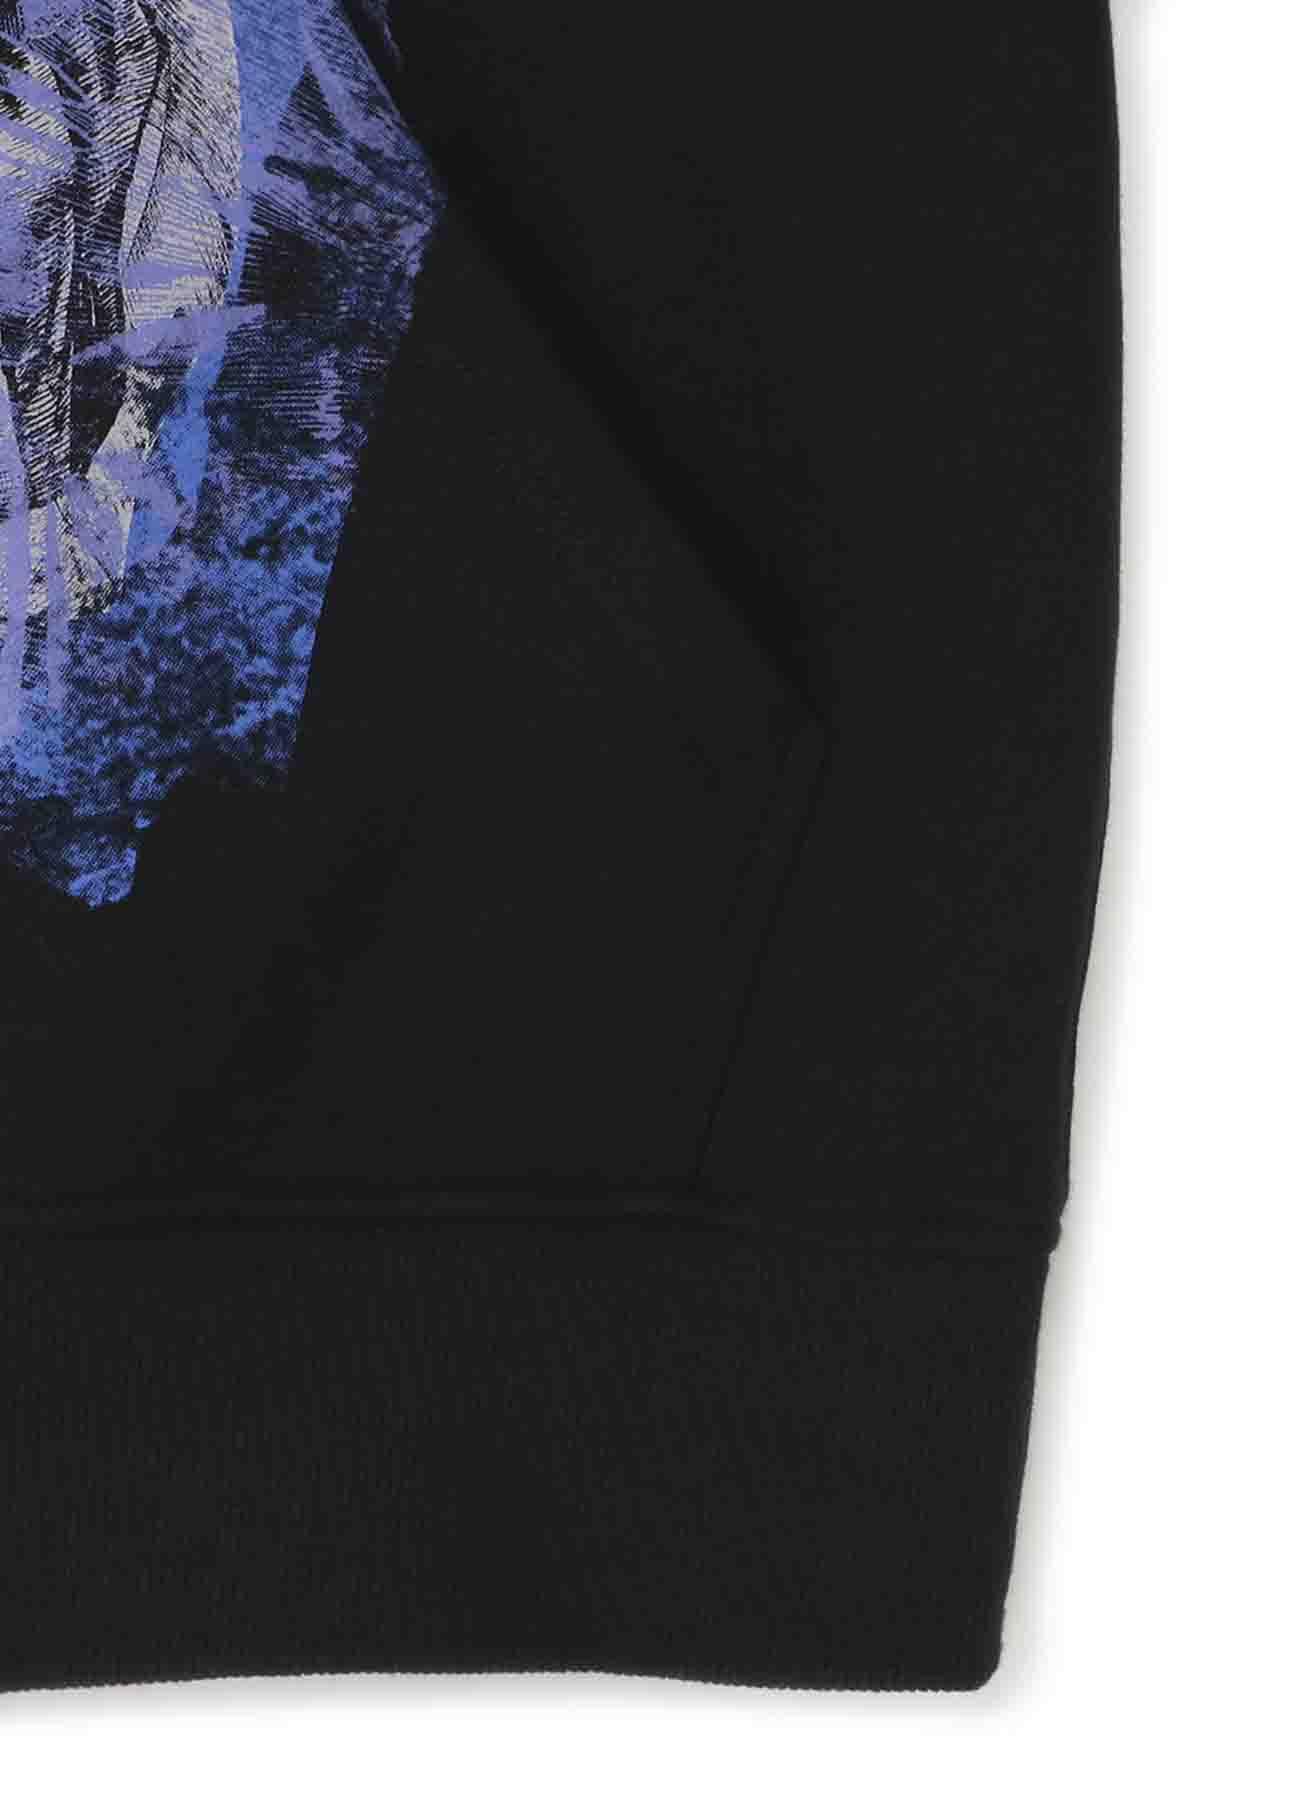 French Terry Stitch Work 「Tomie」Wearing Yohji Yamamoto Dress Tulle Hoodie